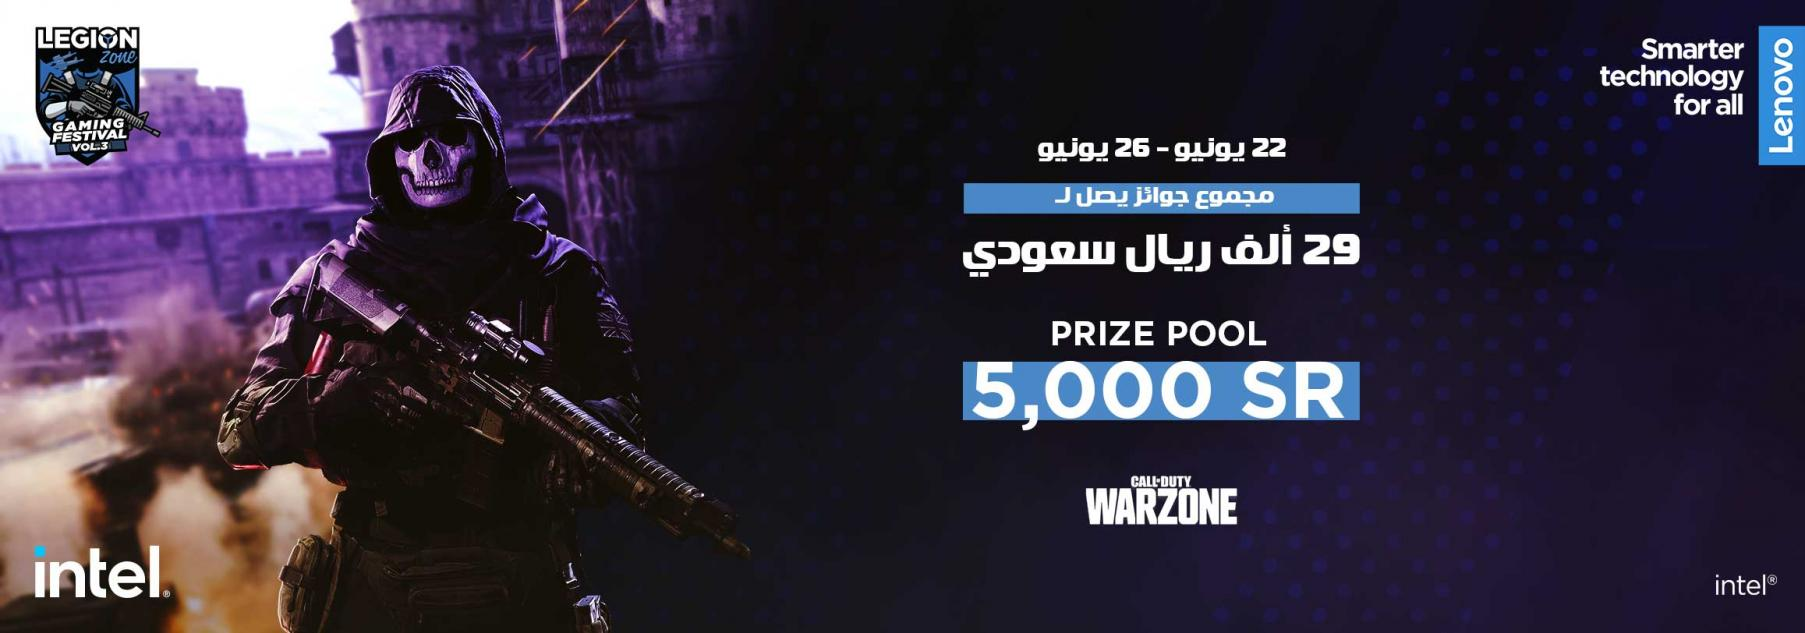 Name:  Legion-Warzone.jpg Views: 617 Size:  96.3 KB